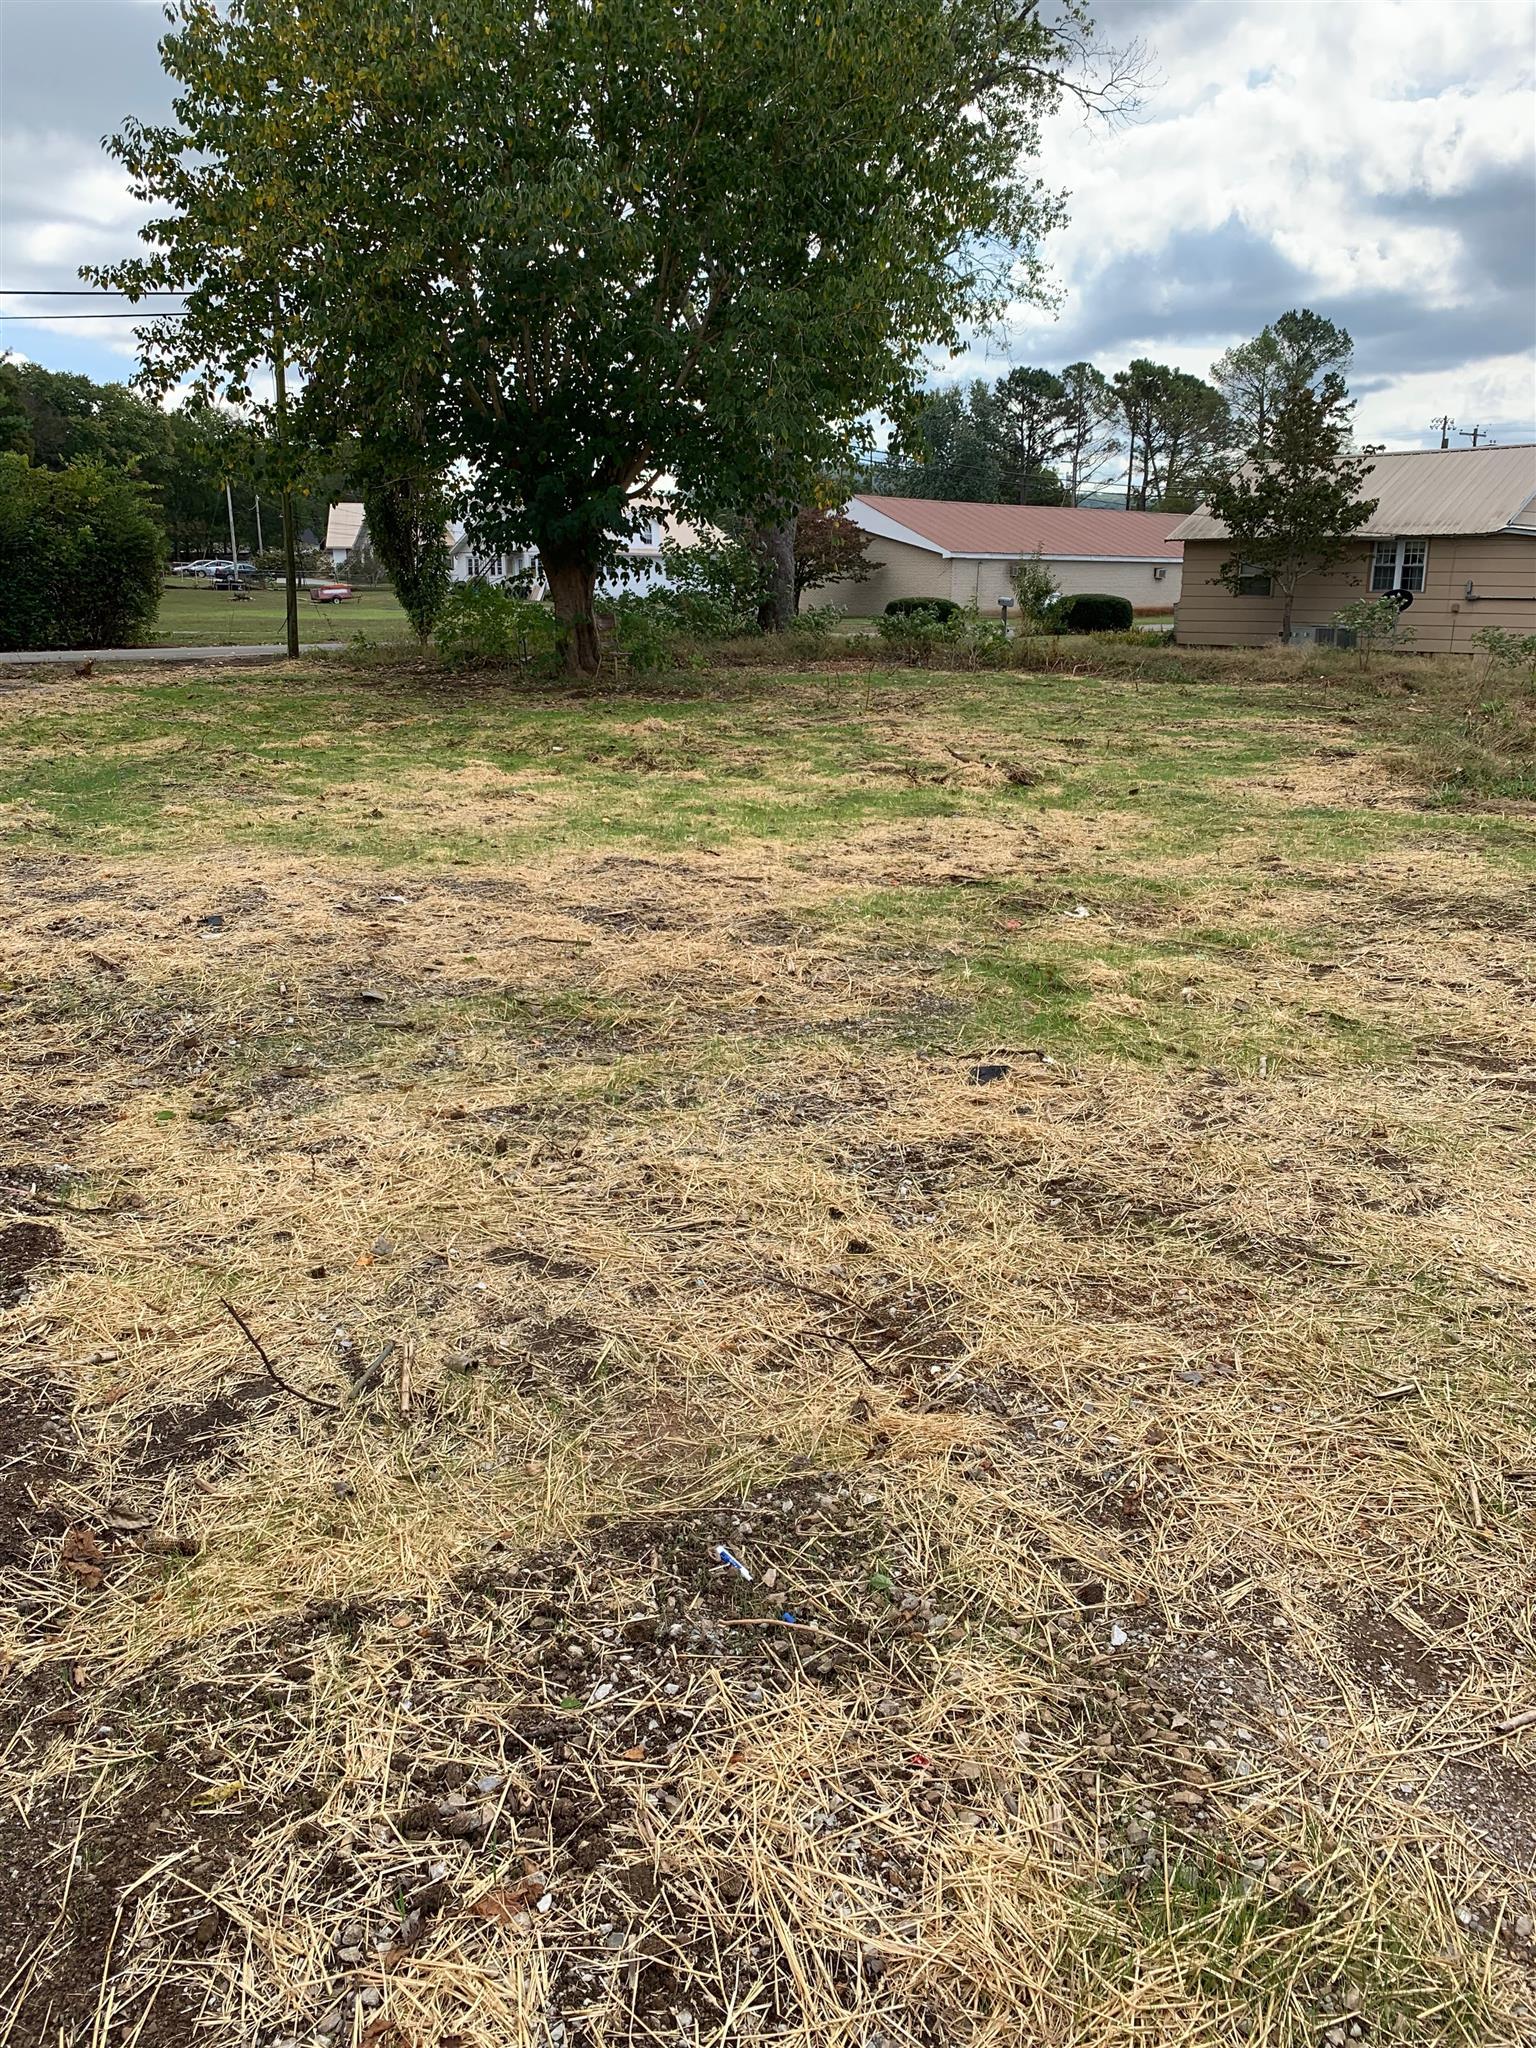 609 Montgomery St, Cowan, TN 37318 - Cowan, TN real estate listing